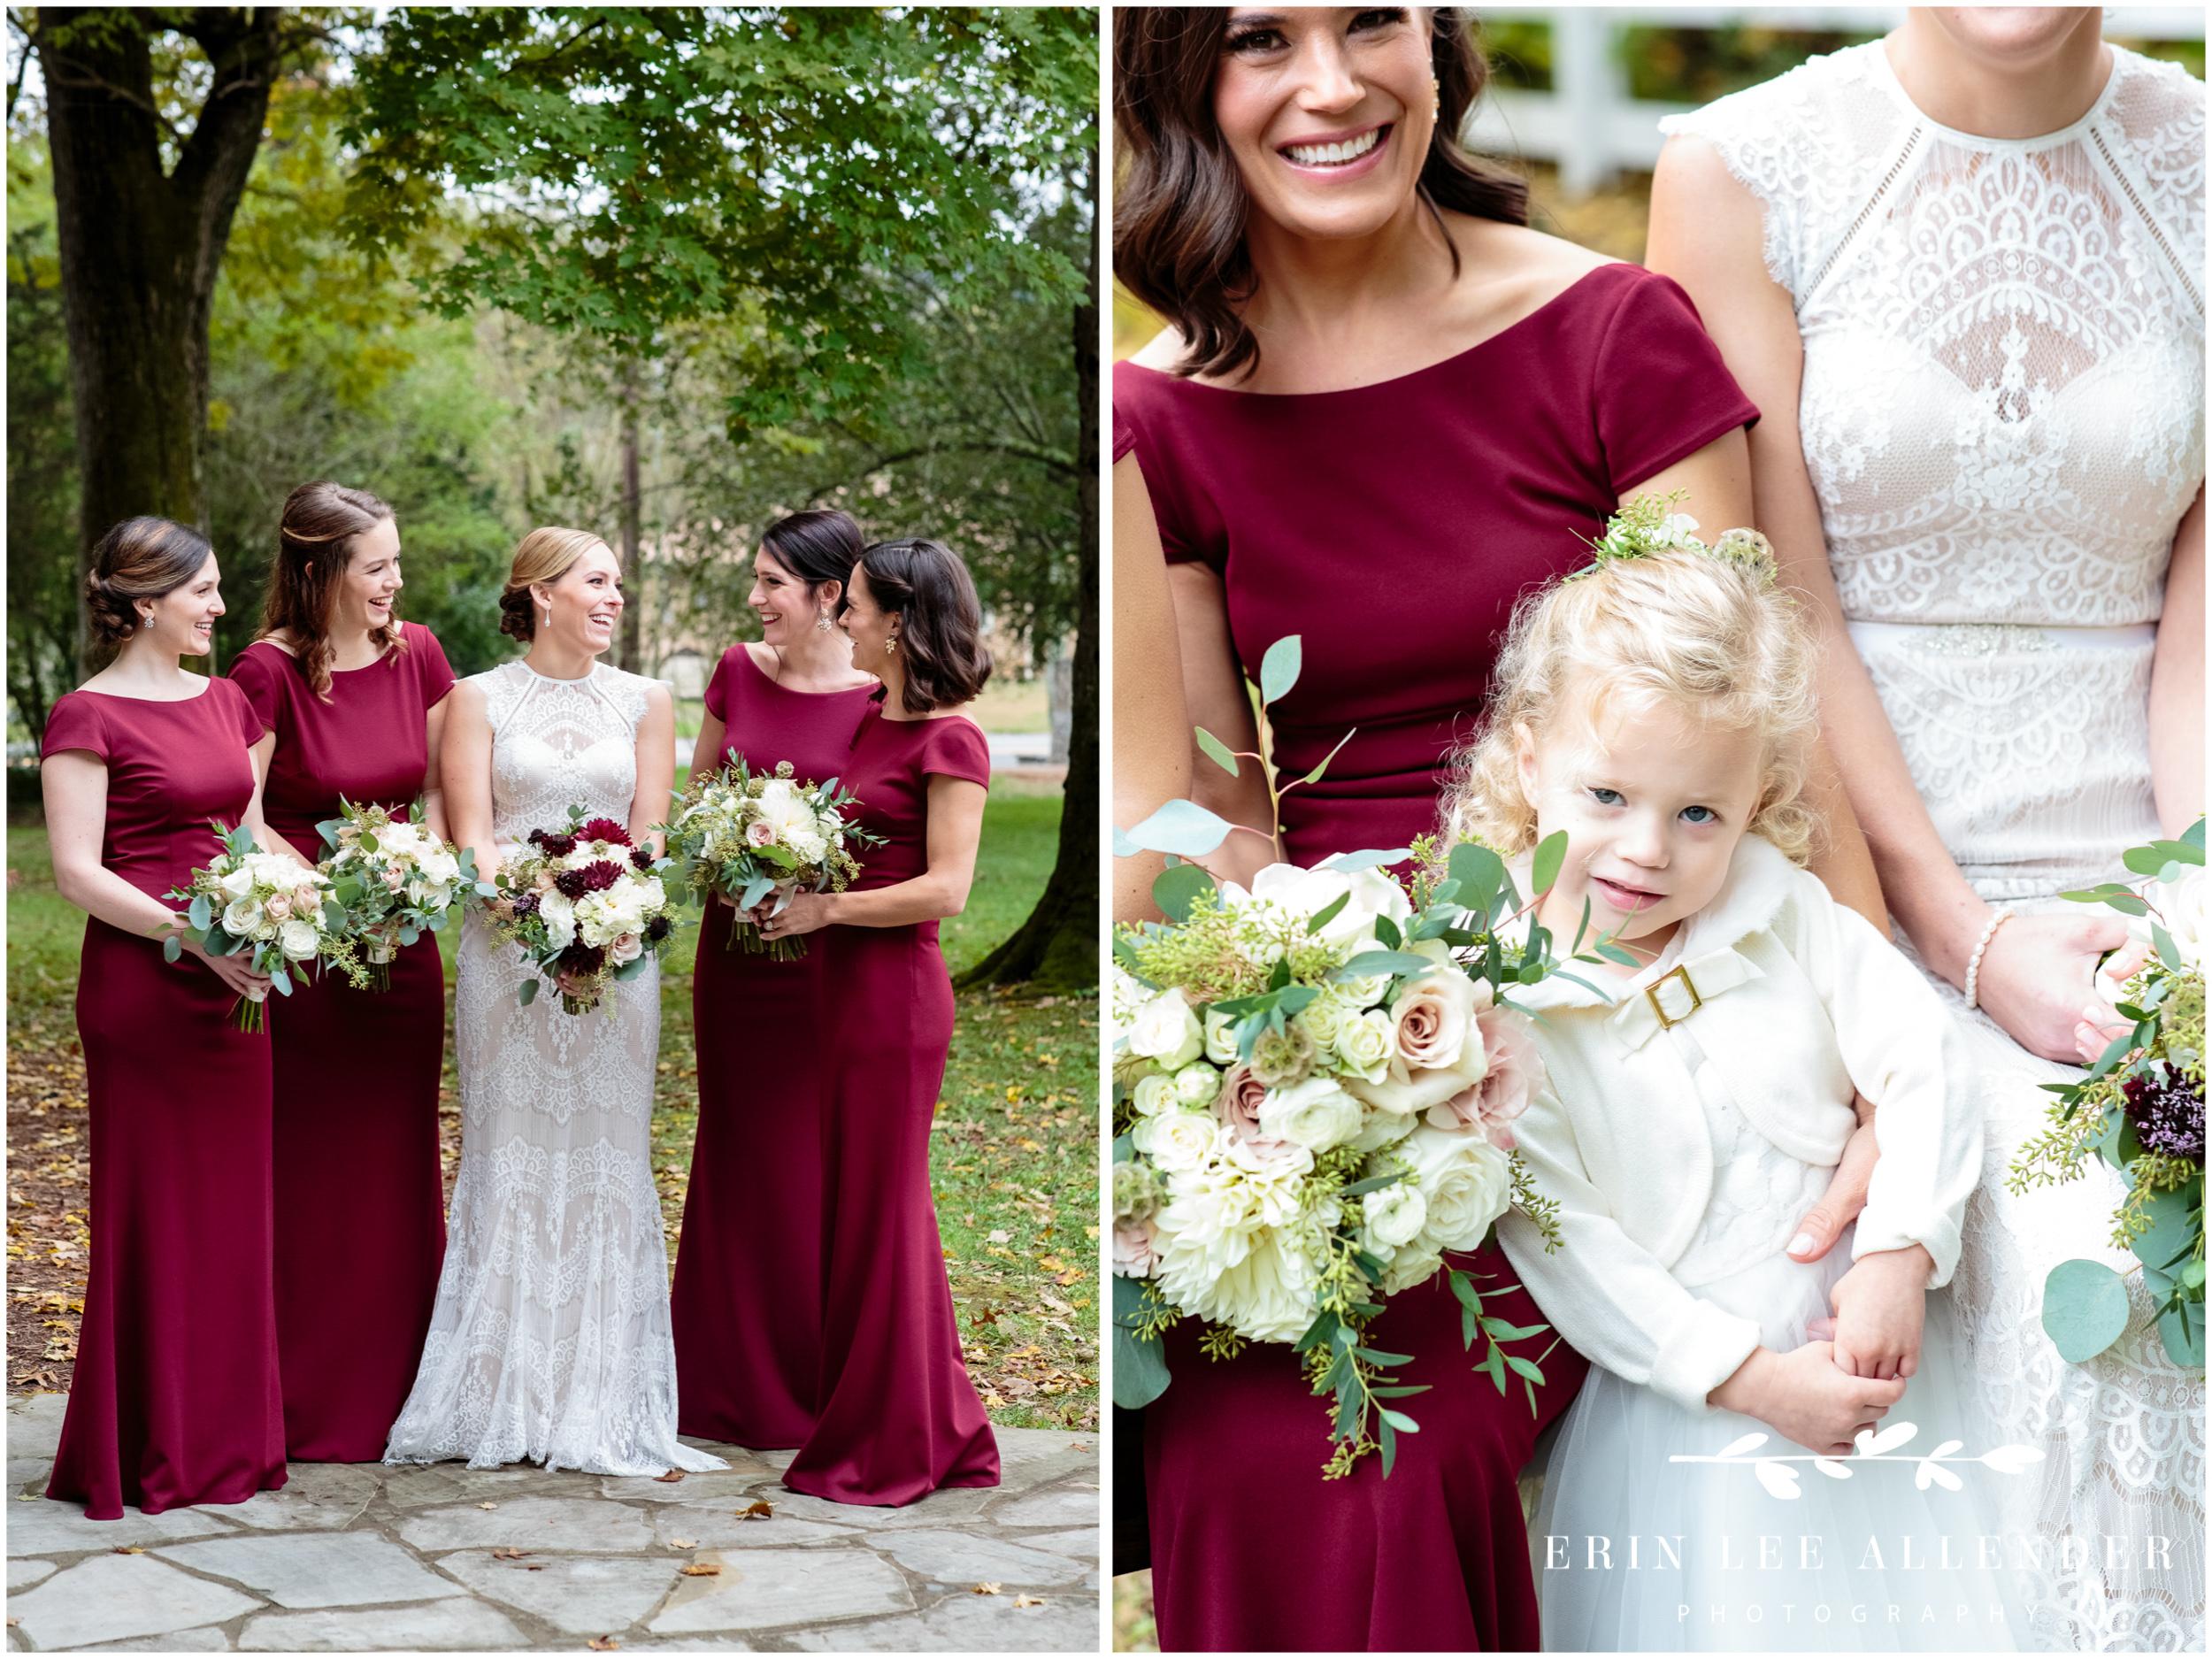 Burgundy-sleeve-bridesmaids-dresses